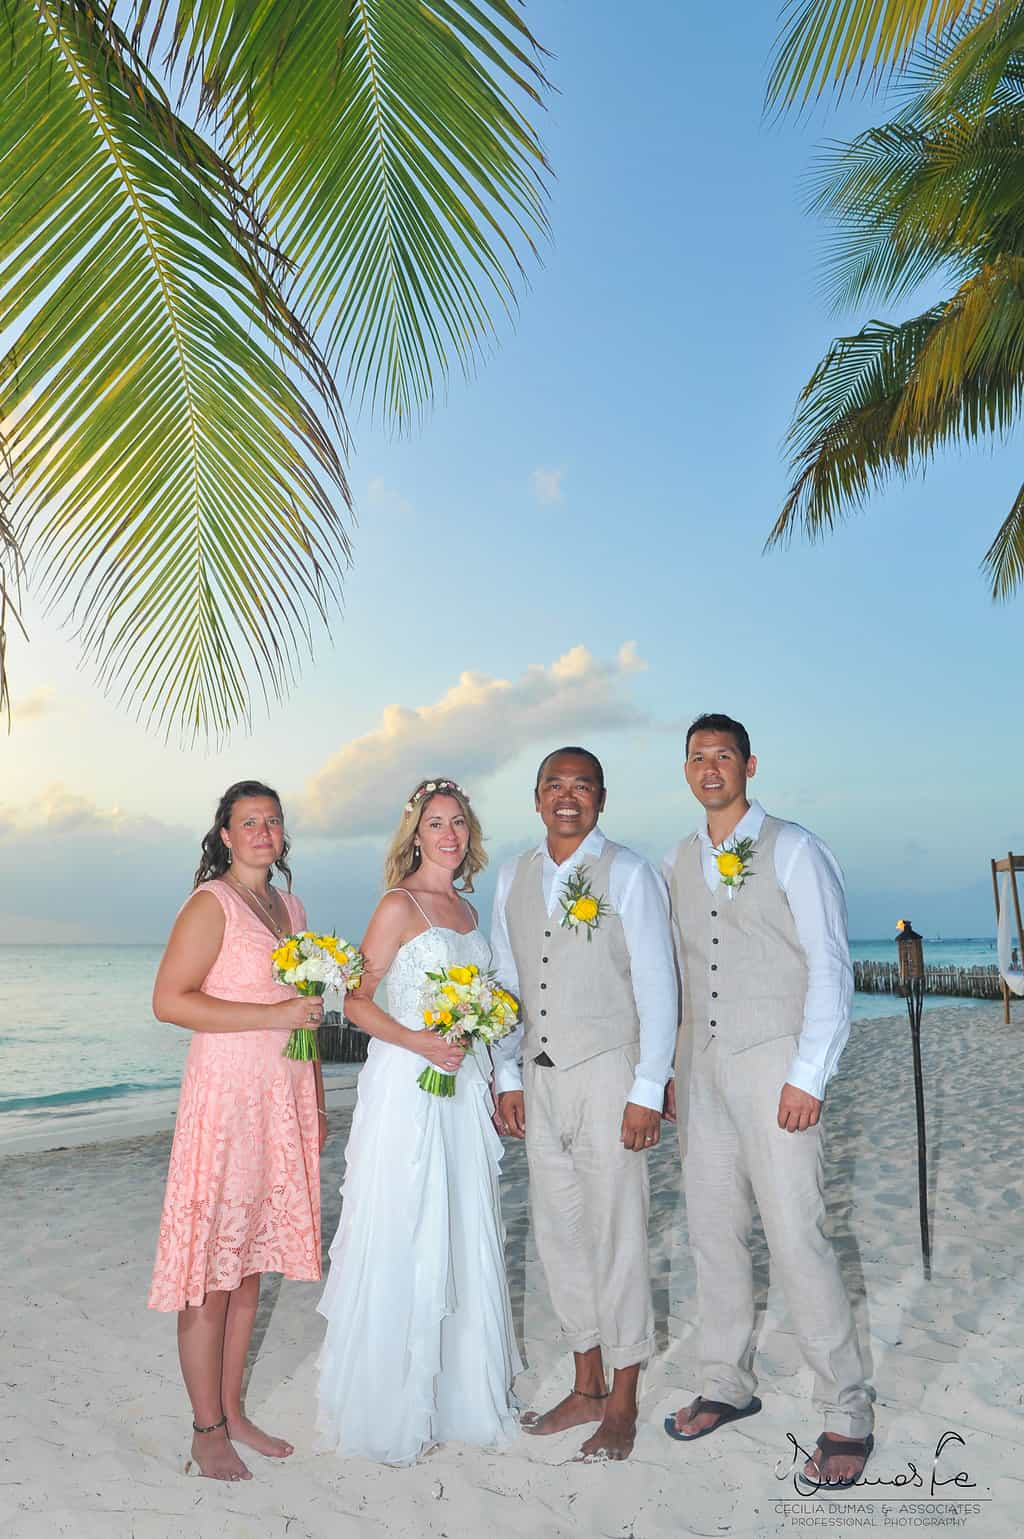 islamujeres-buhos-weddingphotography-heathermel89